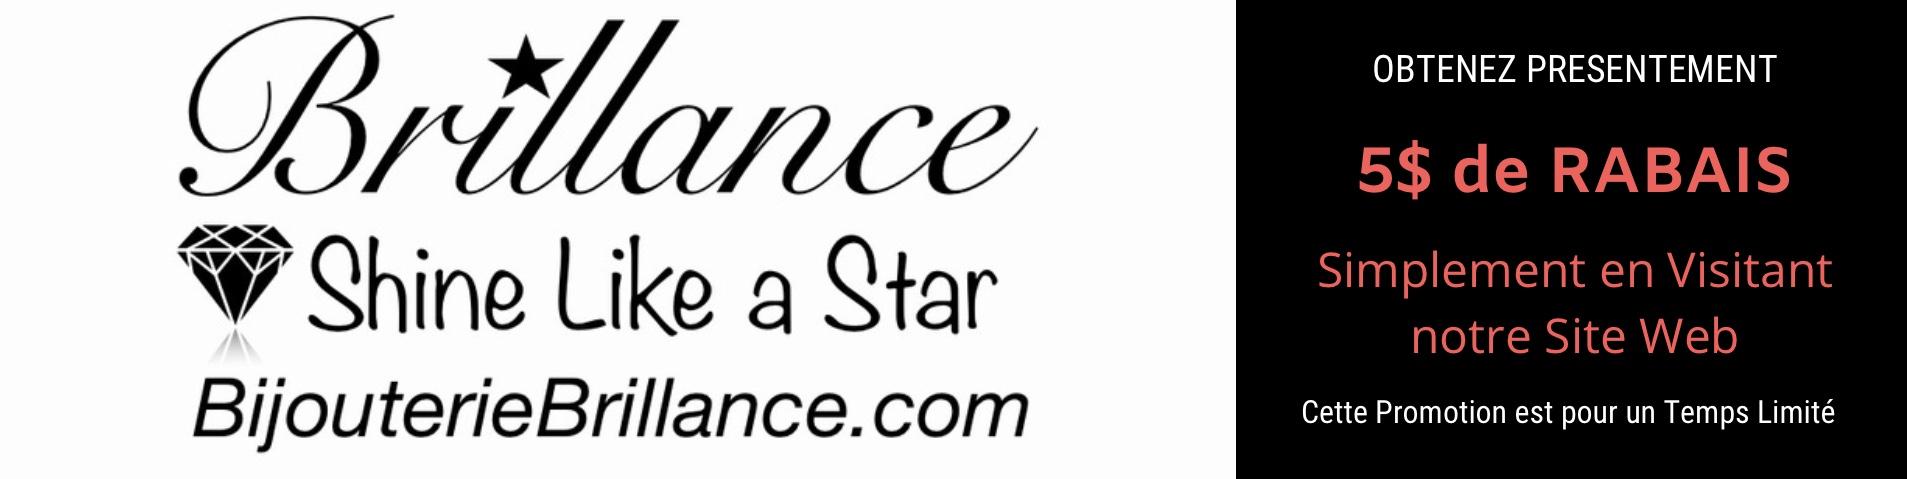 www.BijouterieBrillance.com